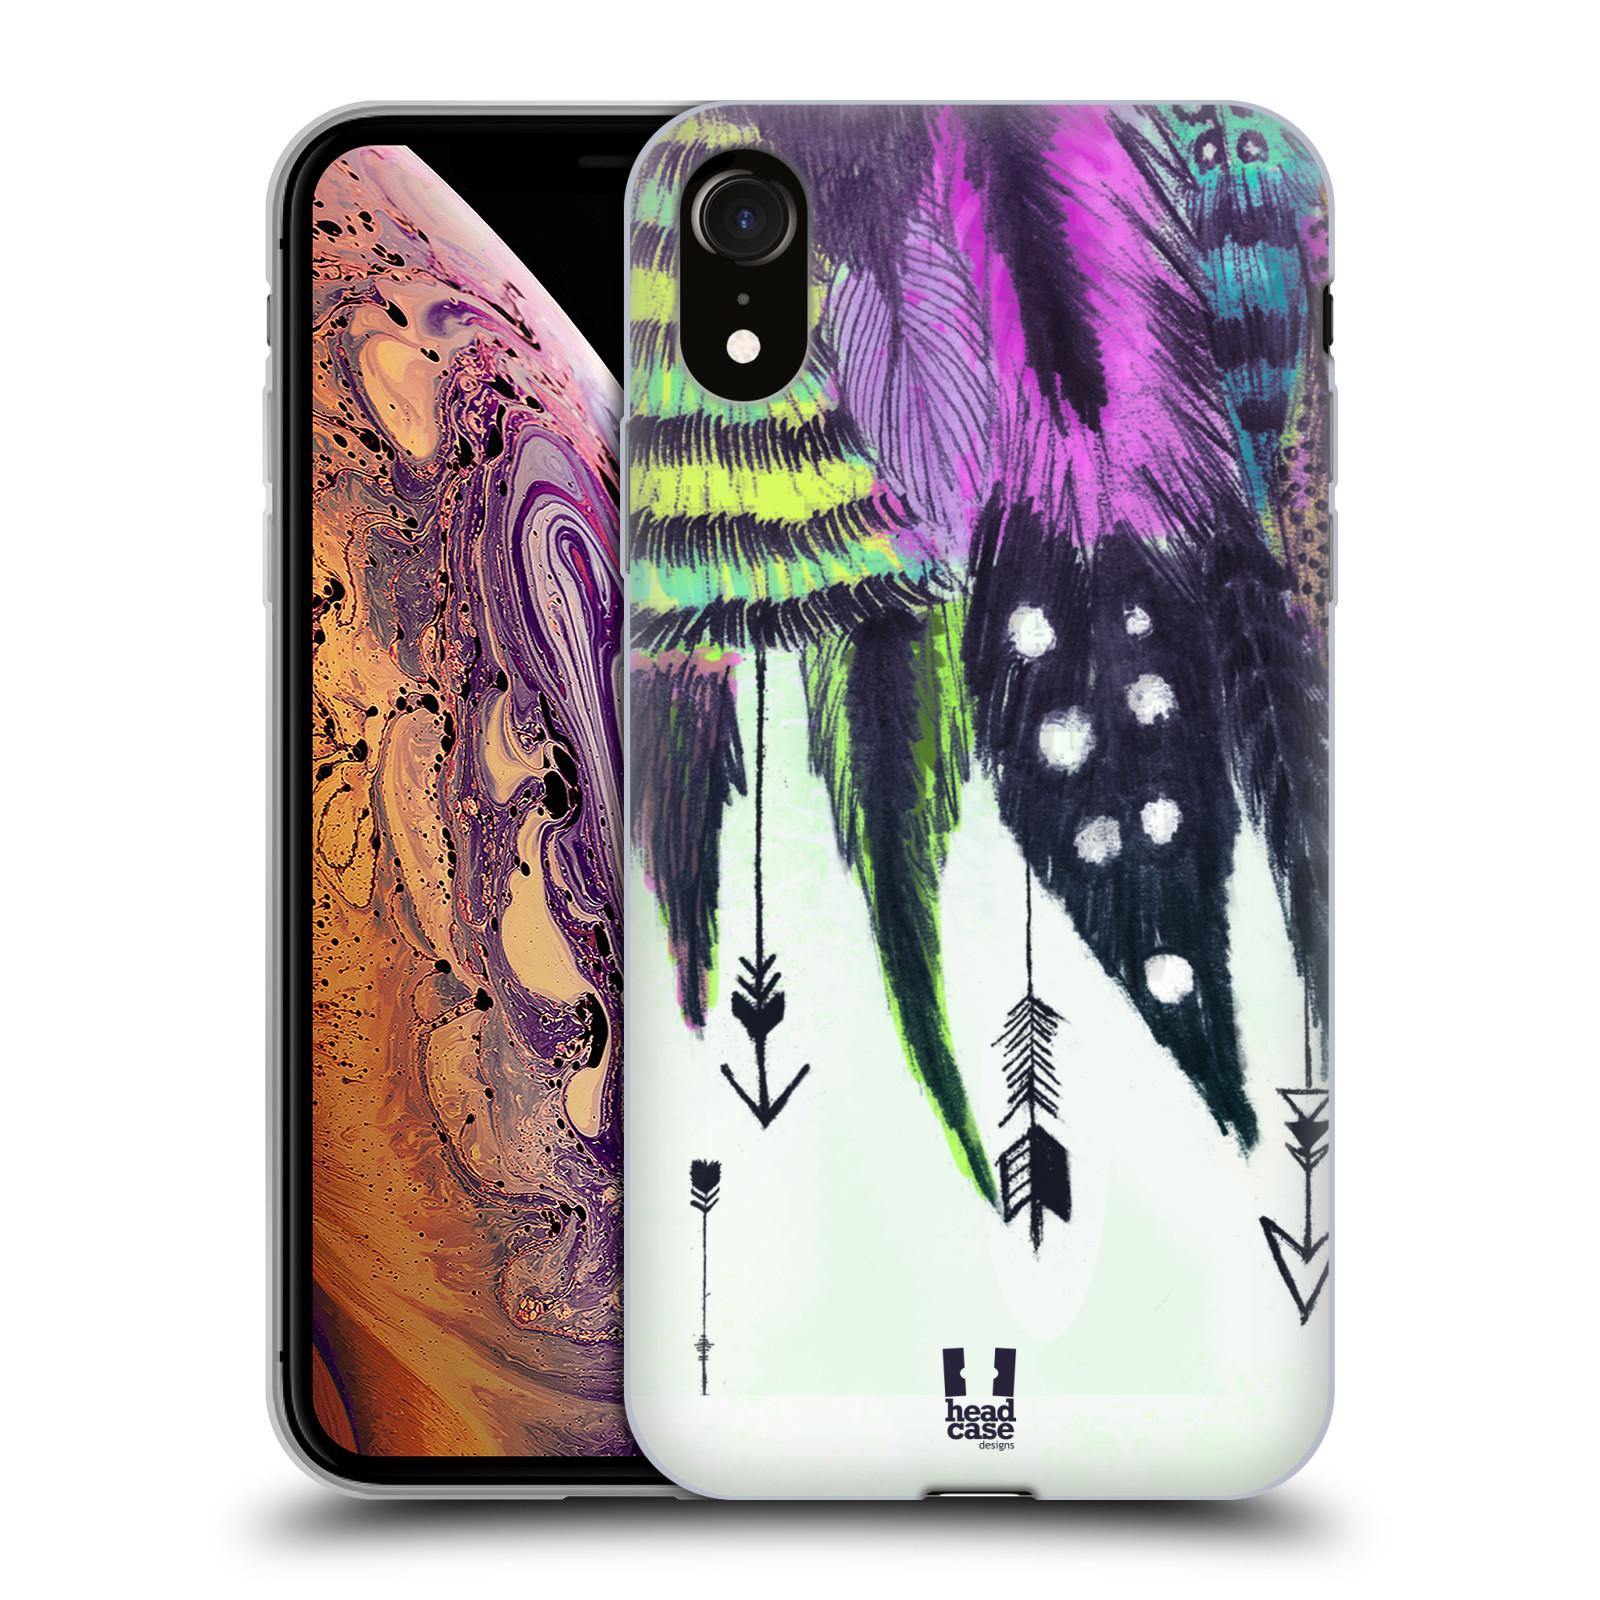 Silikonové pouzdro na mobil Apple iPhone XR - Head Case - PÍRKA ROMANTIC